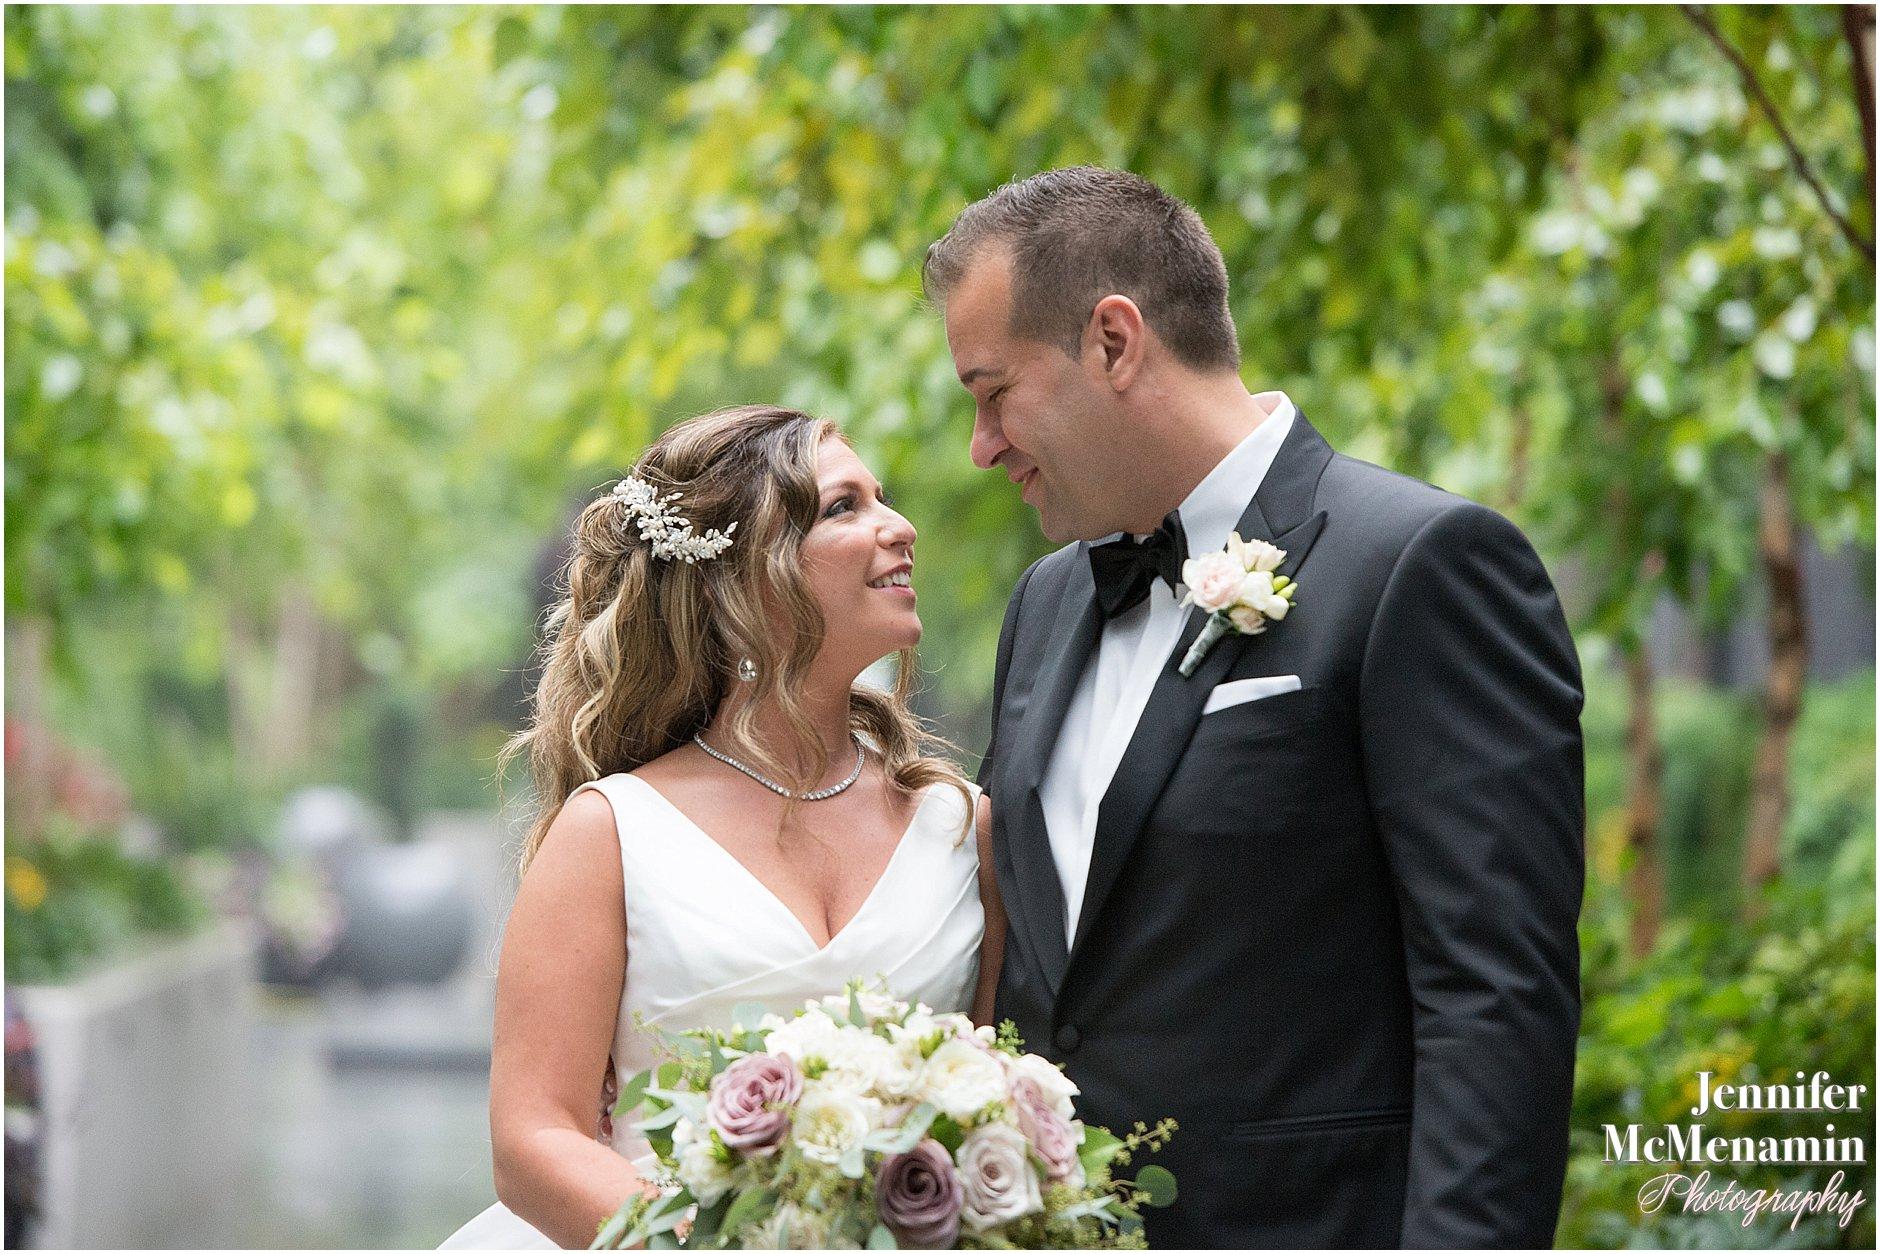 Jennifer-McMenamin-Photography-Sagamore-Pendry-wedding_0486.jpg